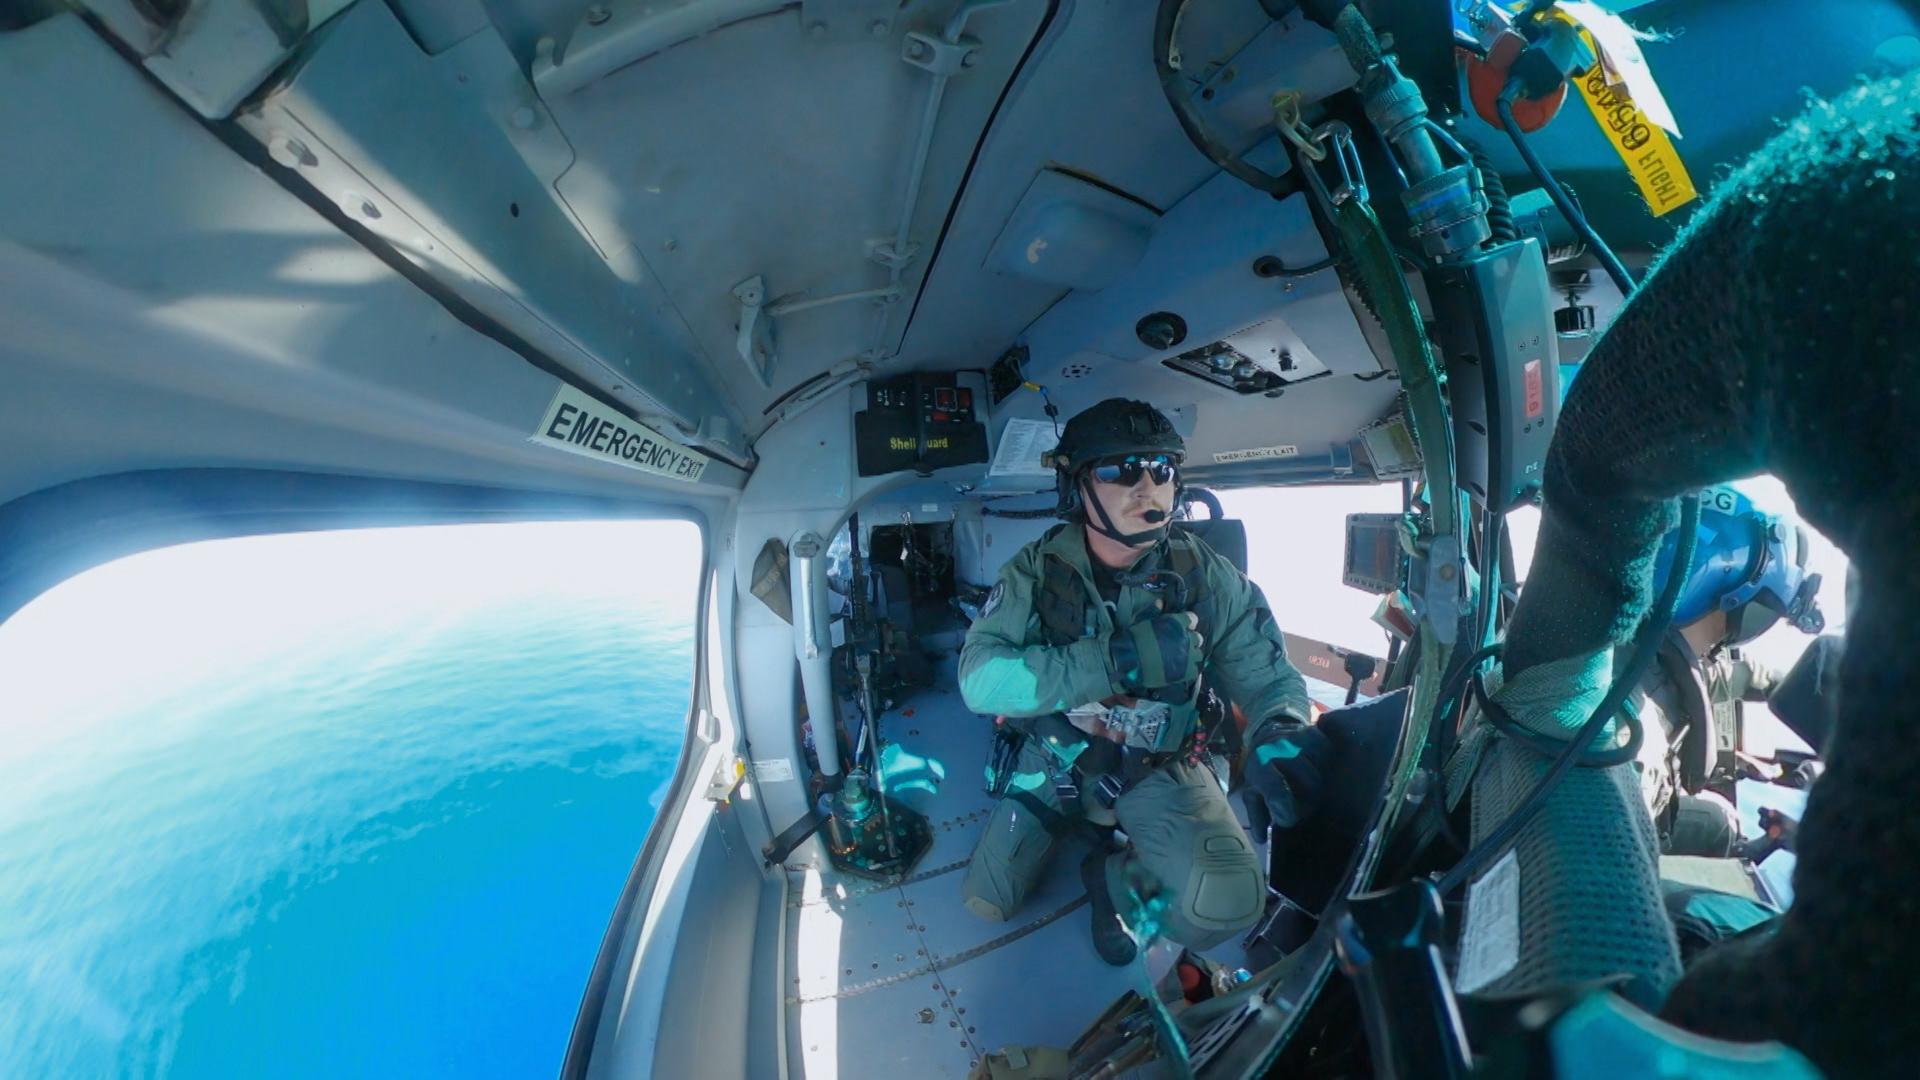 Coast Guard: Mission Critical : In a Marathon Minute